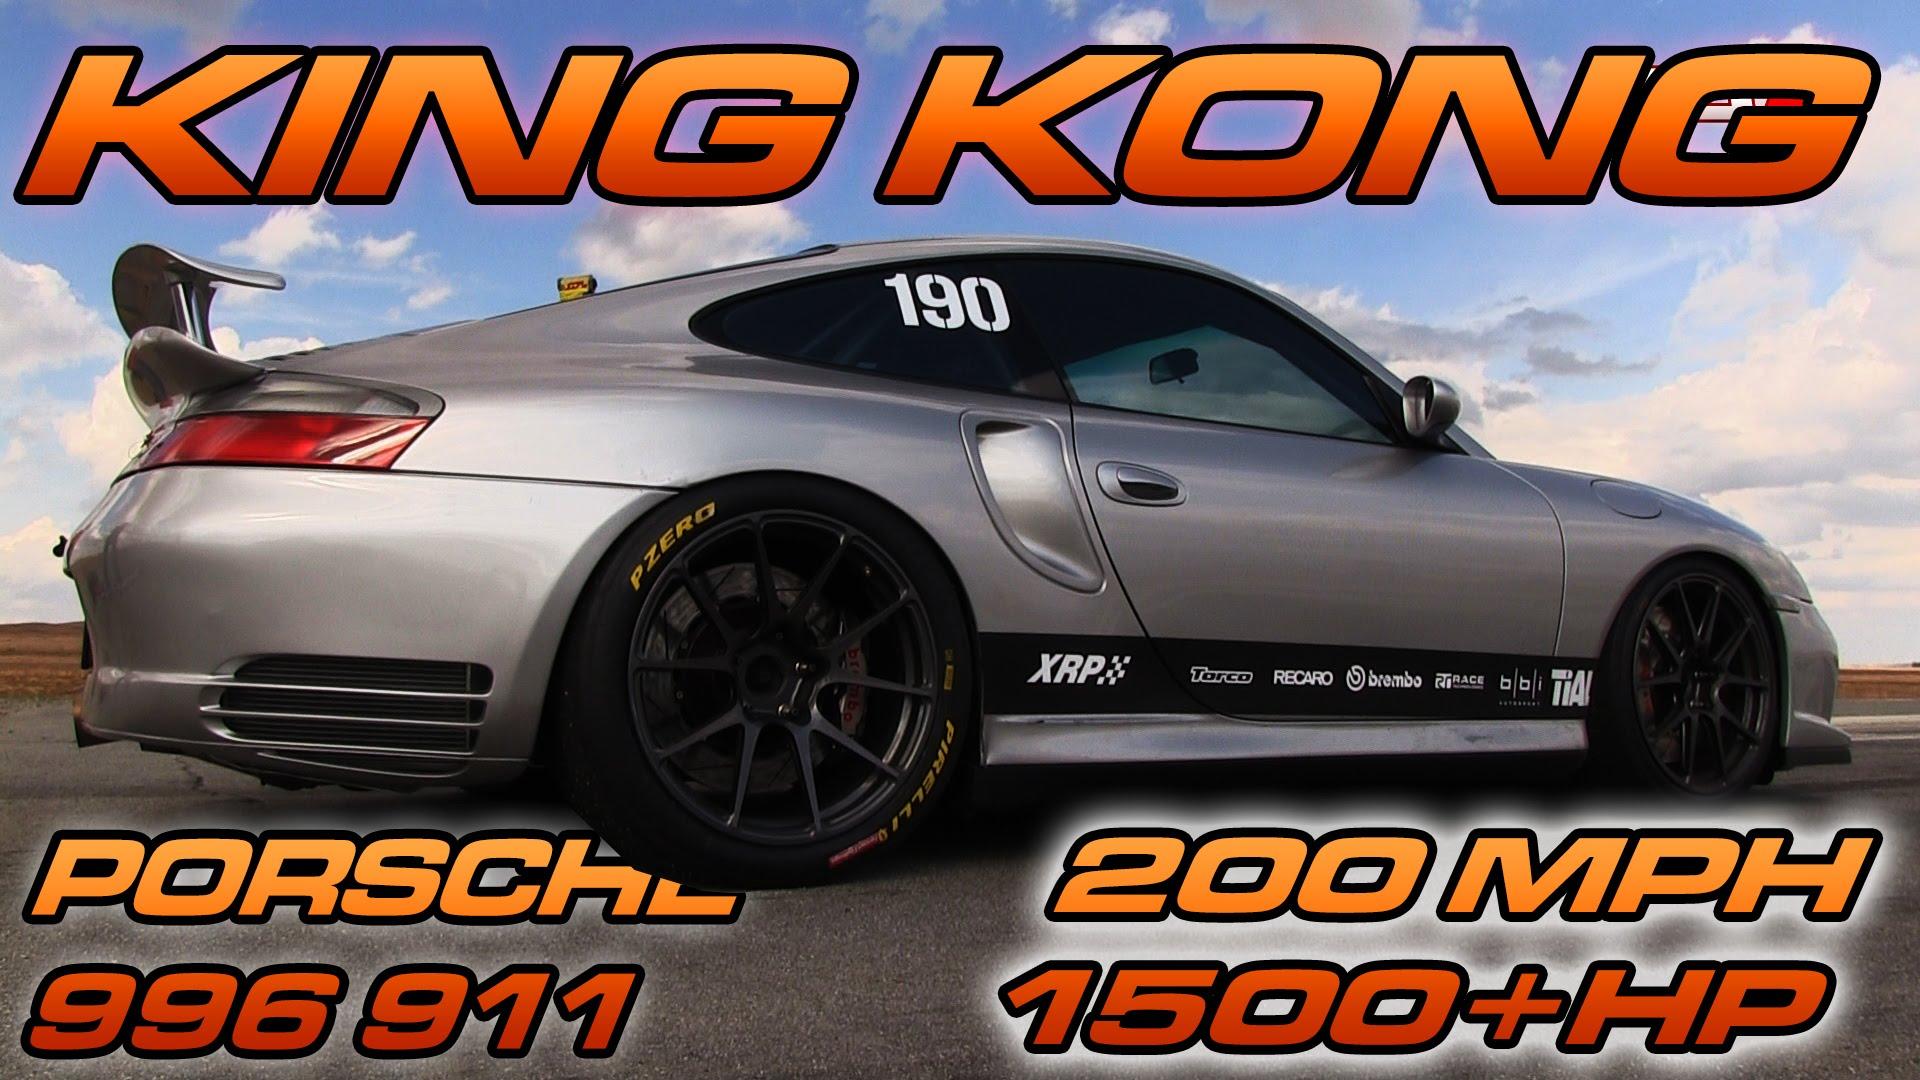 1500HP TT Porsche 911 - 200 MPH Half-Mile